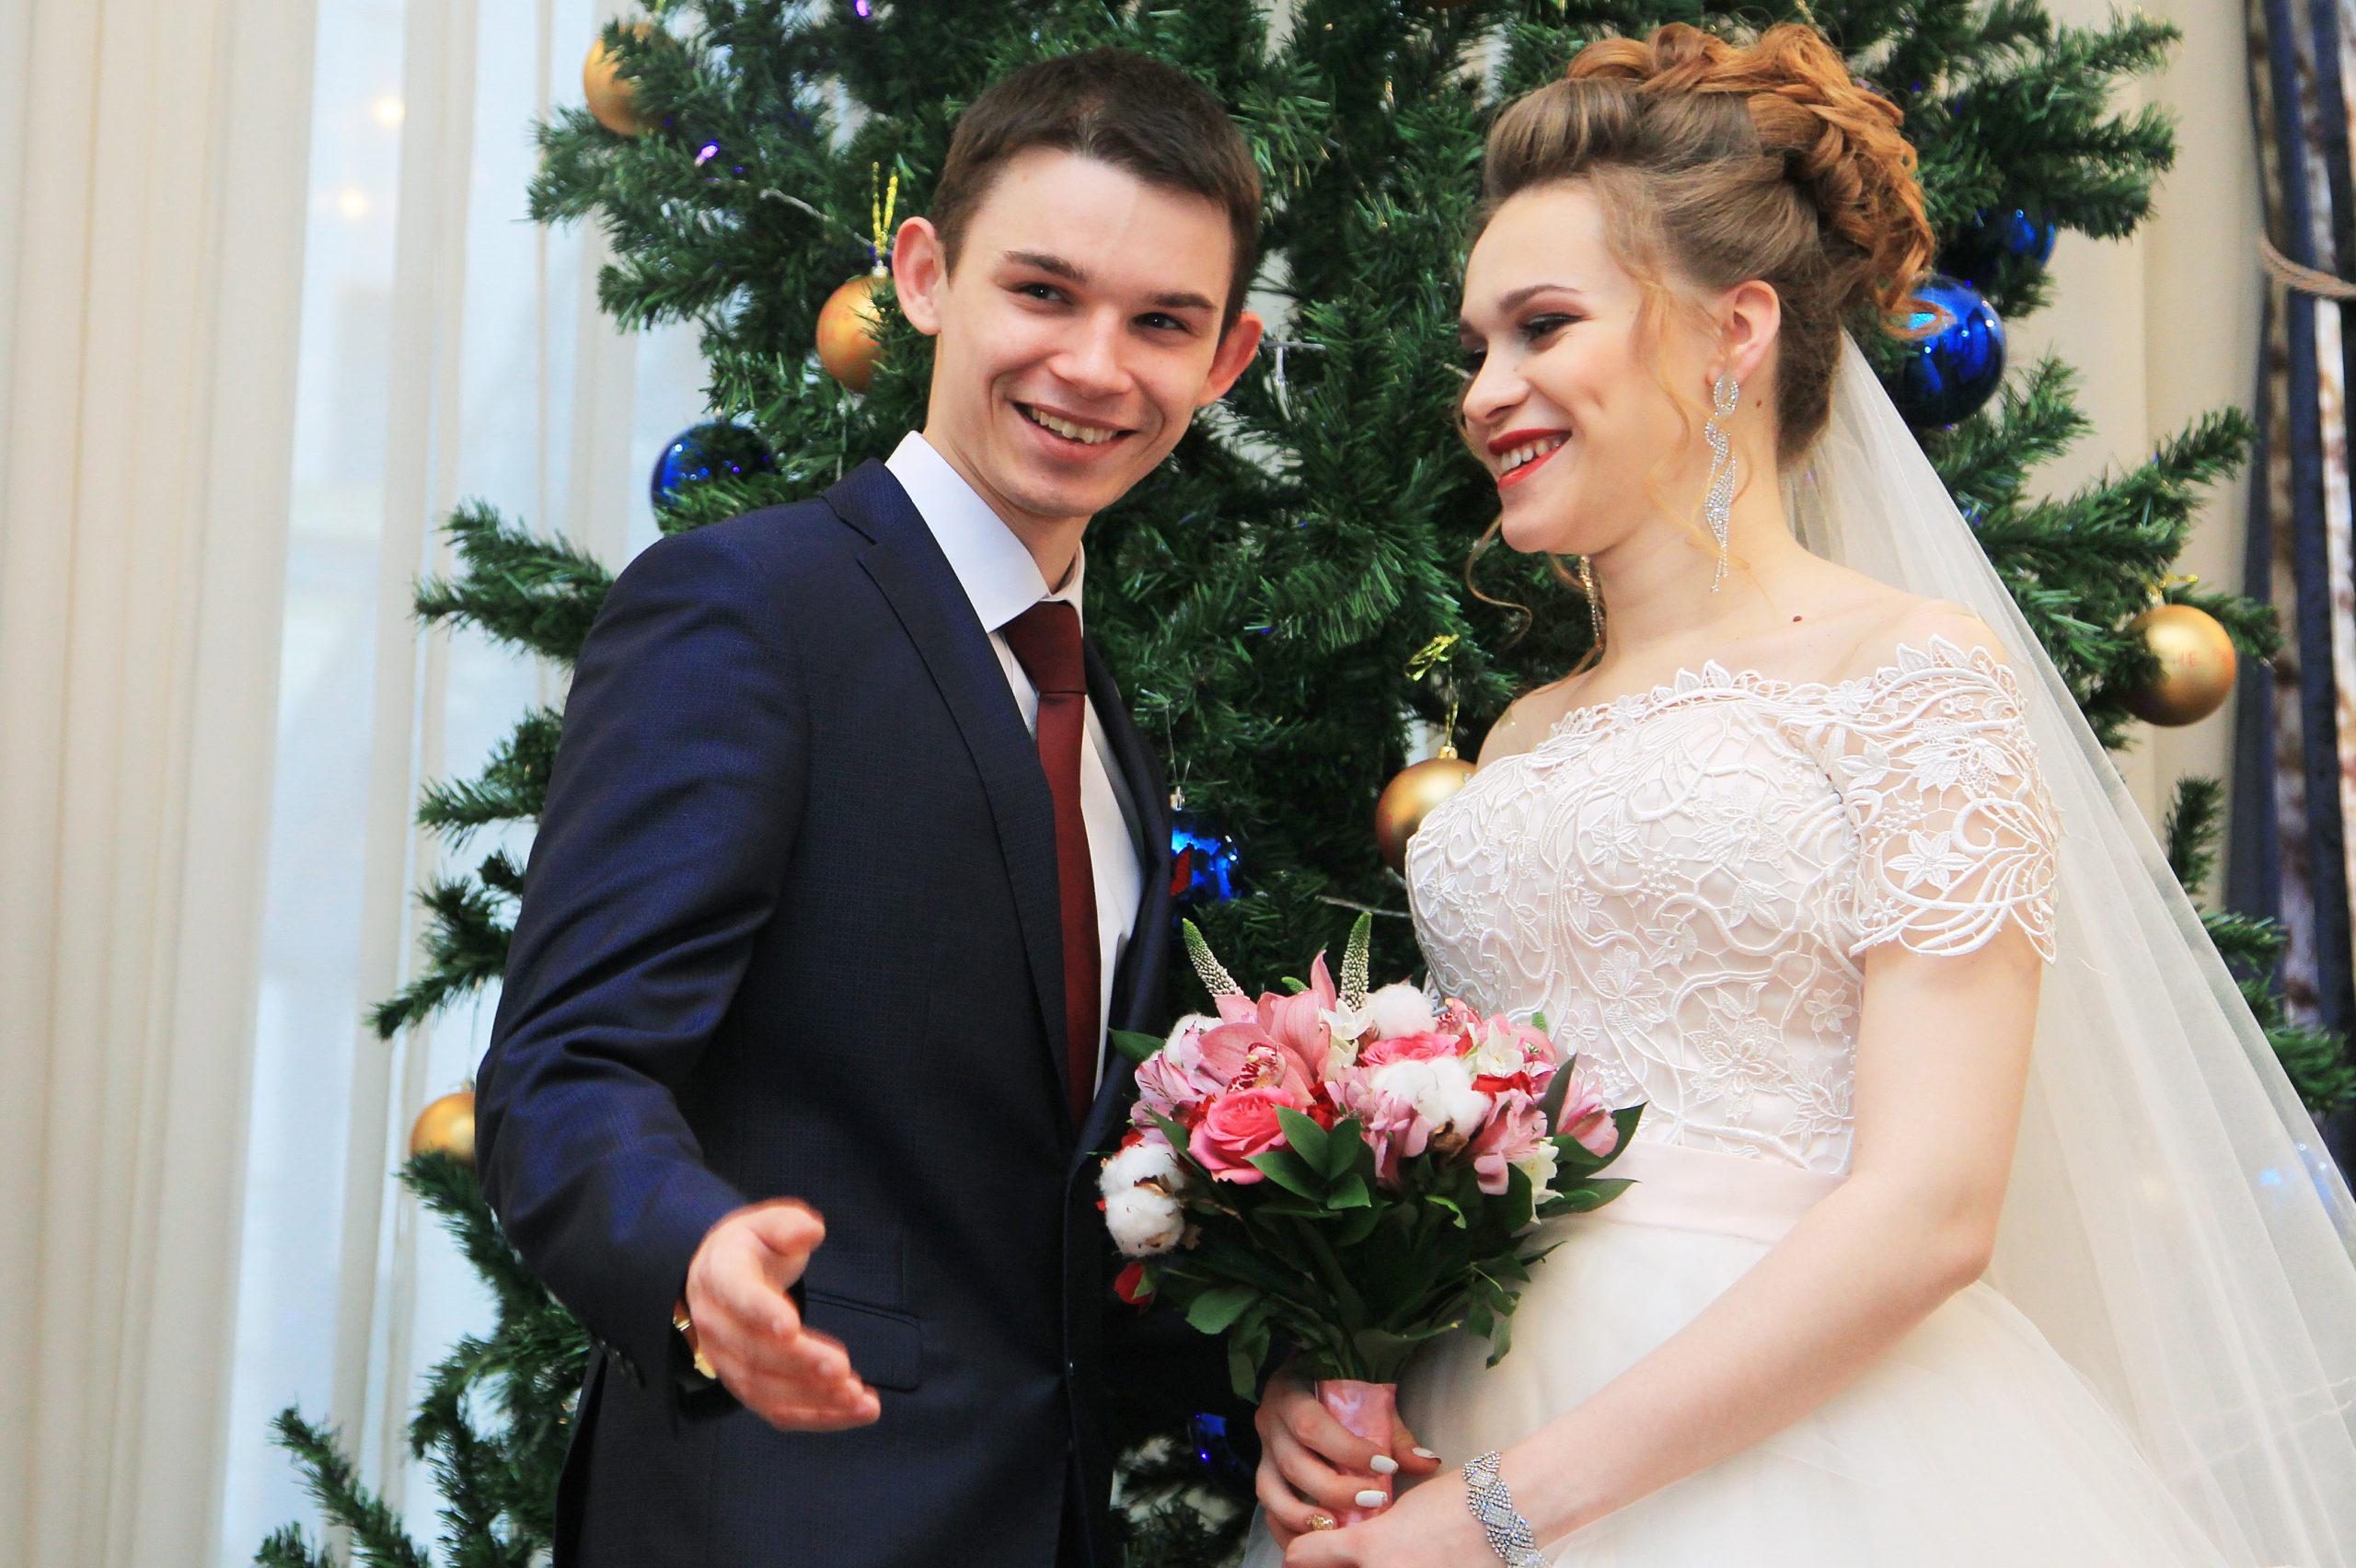 В Москве за 20 лет более 12 тыс пар заключили брак в новогодние праздники. Фото: Наталия Нечаева, «Вечерняя Москва»